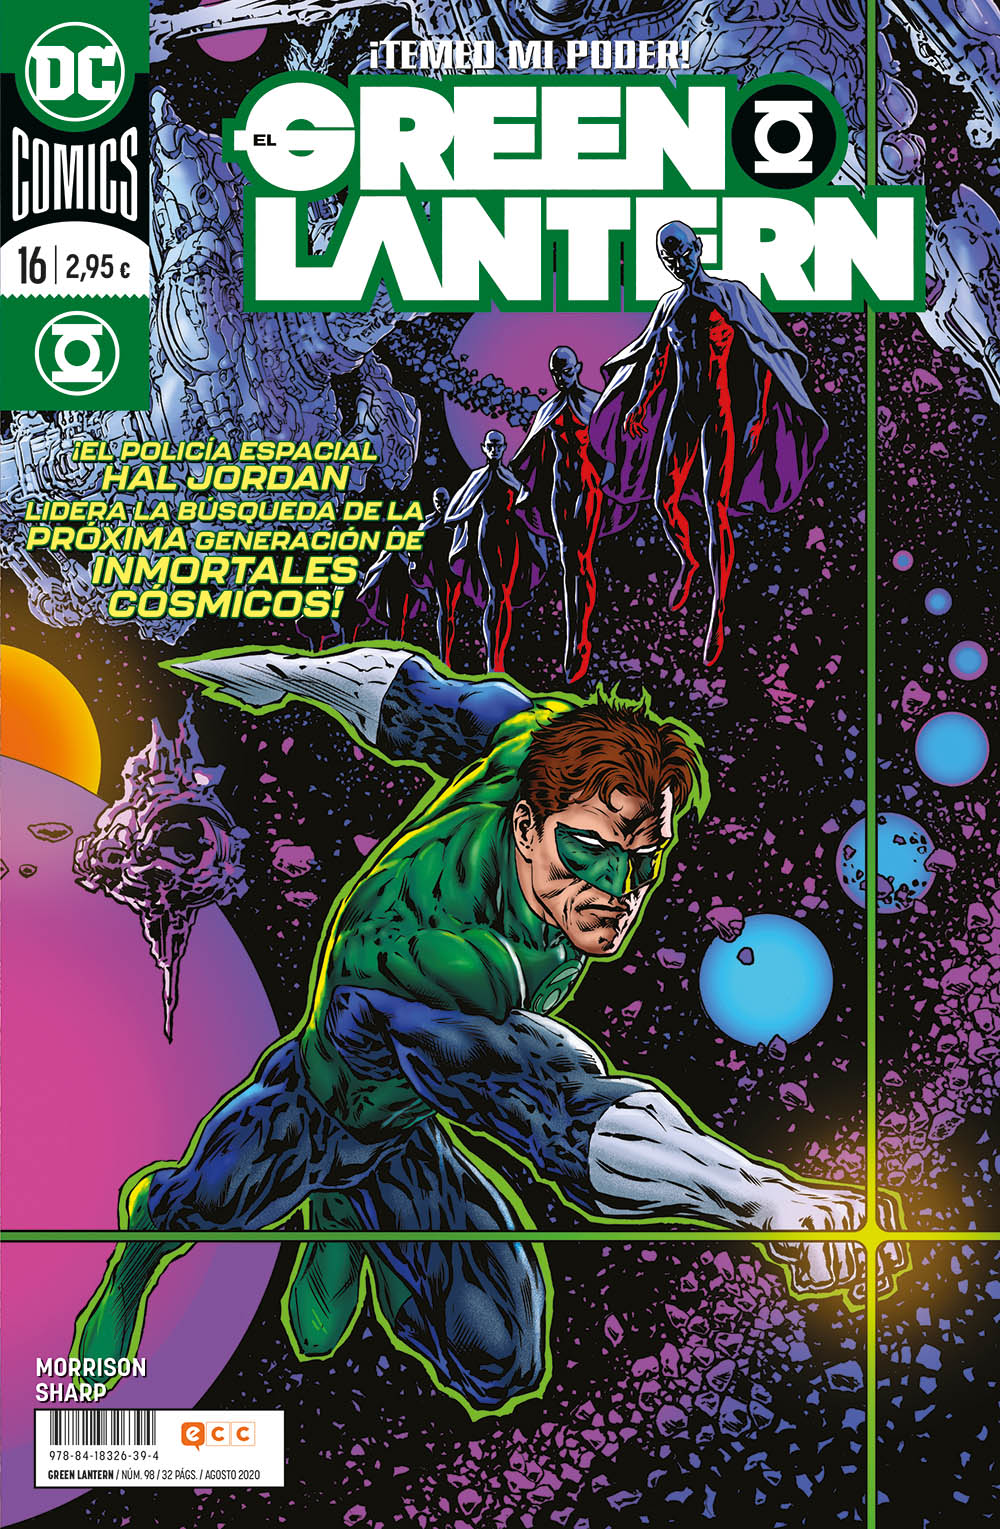 Green Lantern #98 / 16